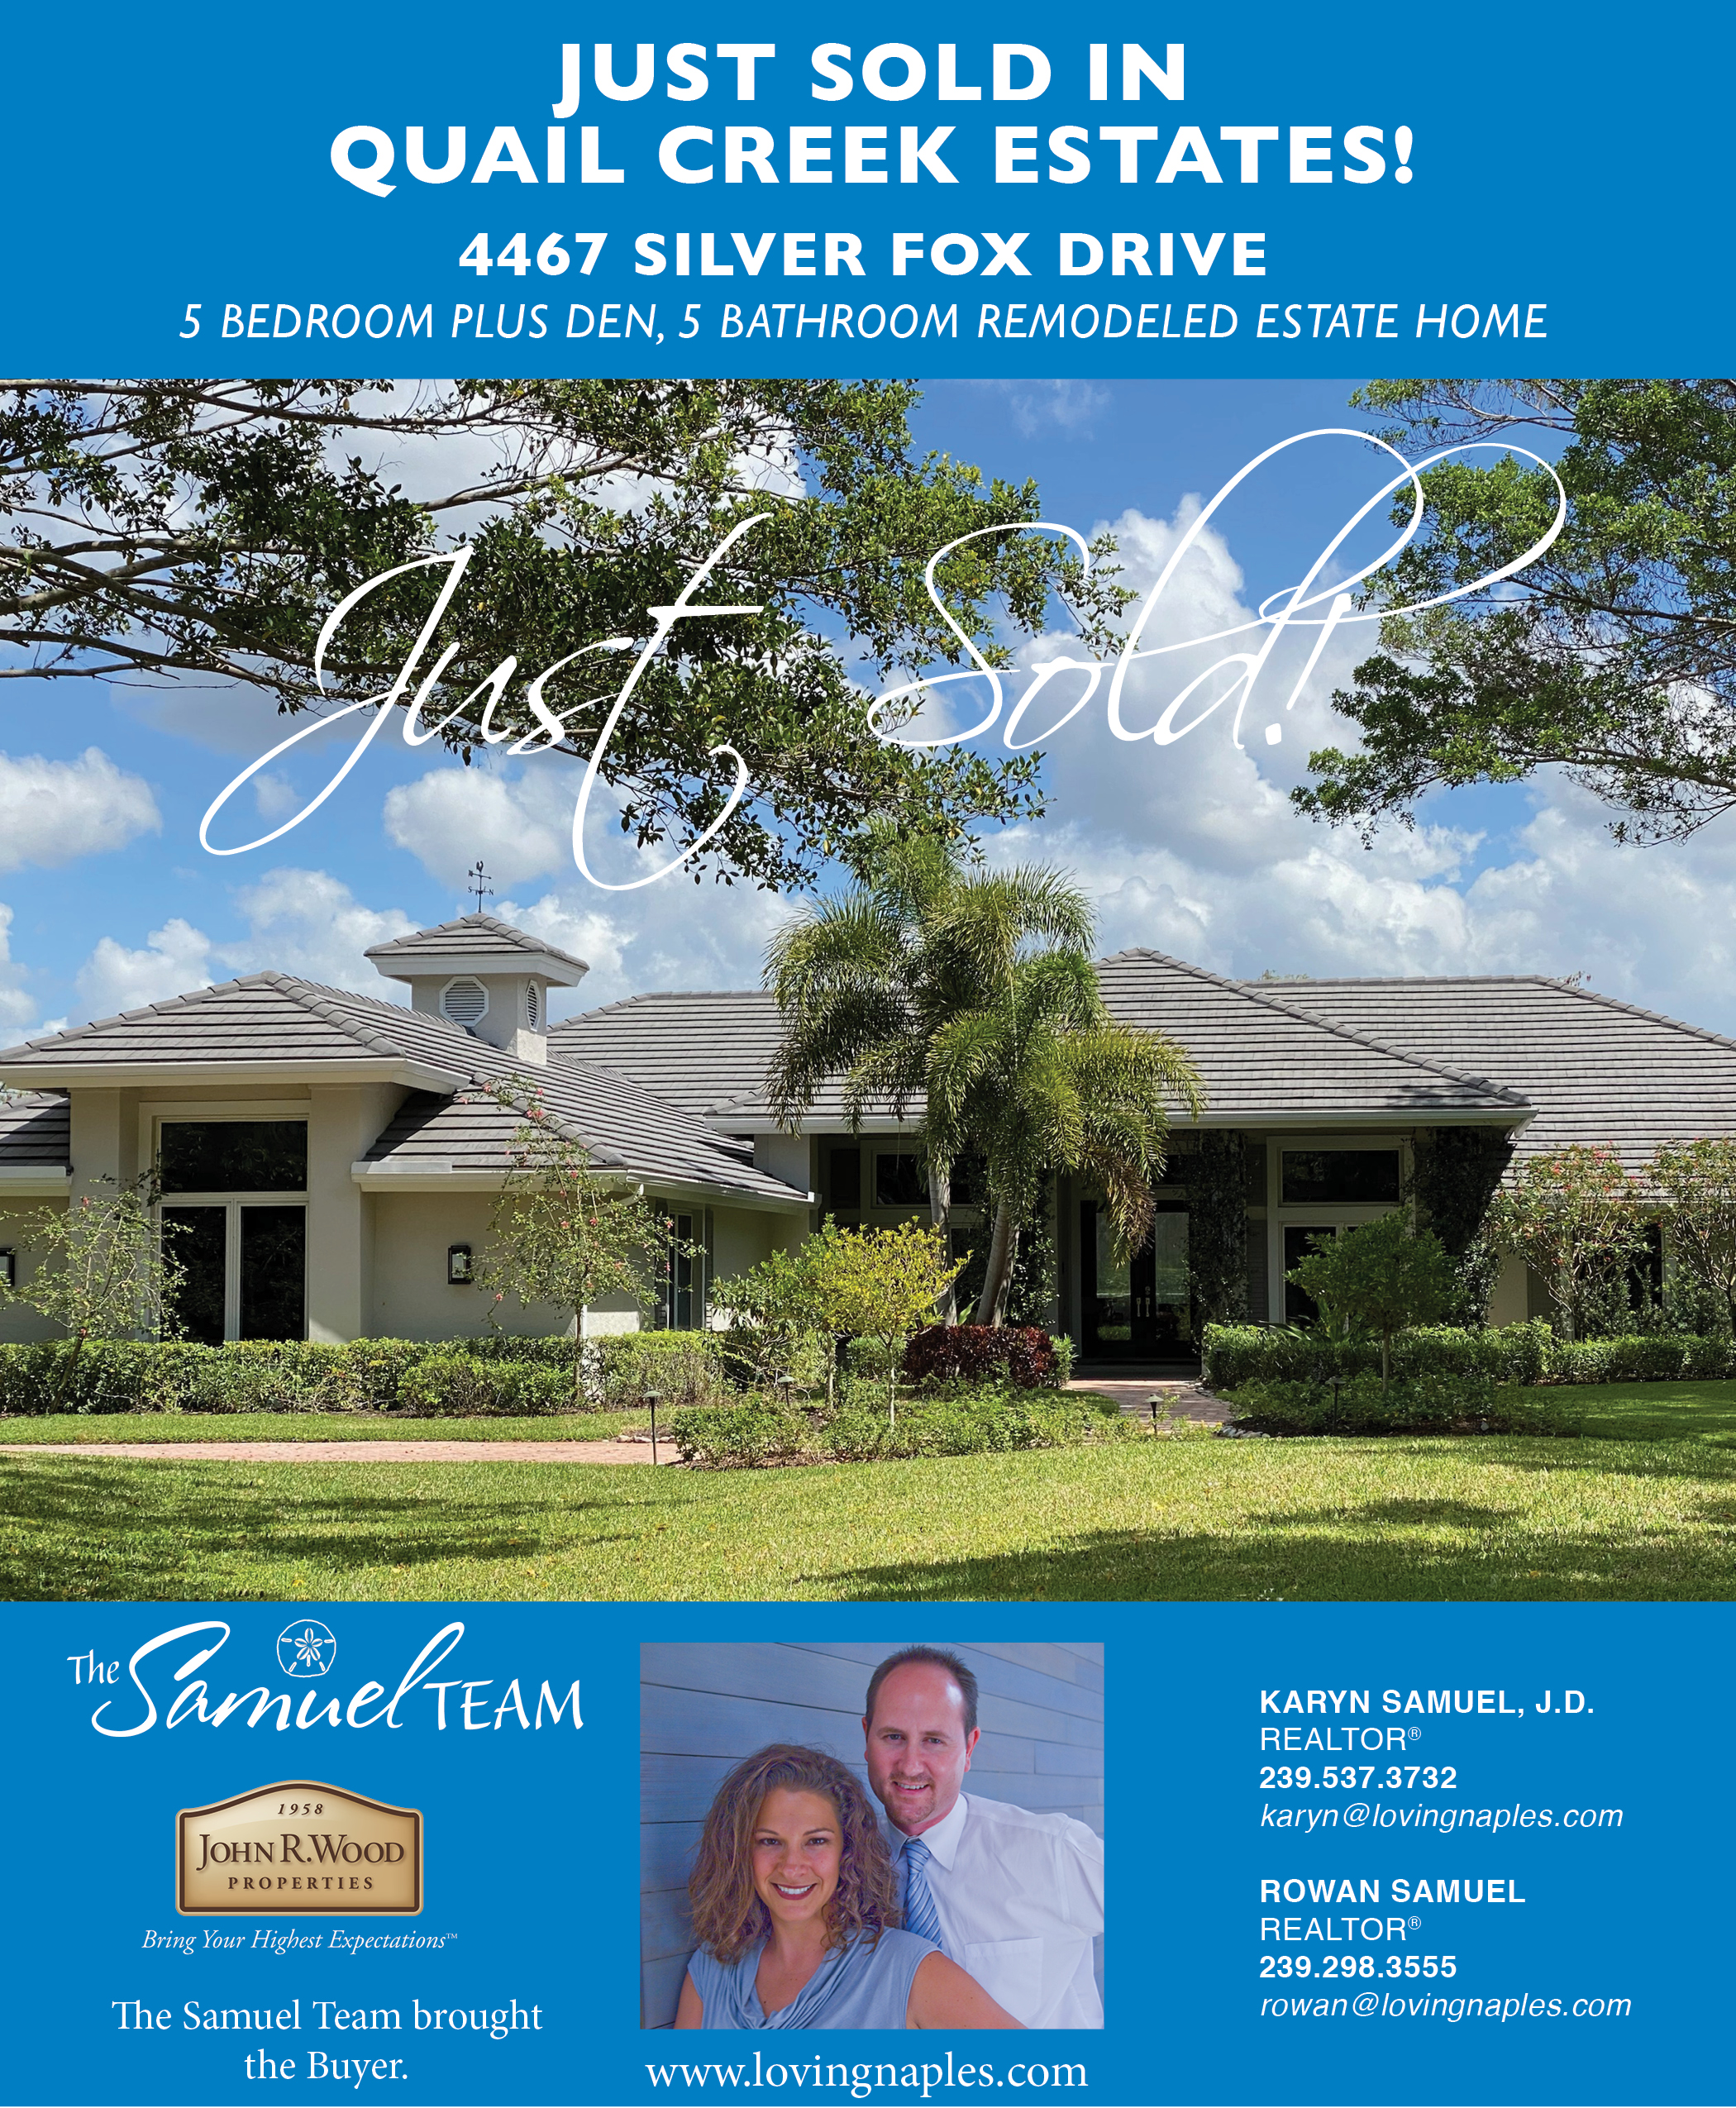 4467 silver fox drive